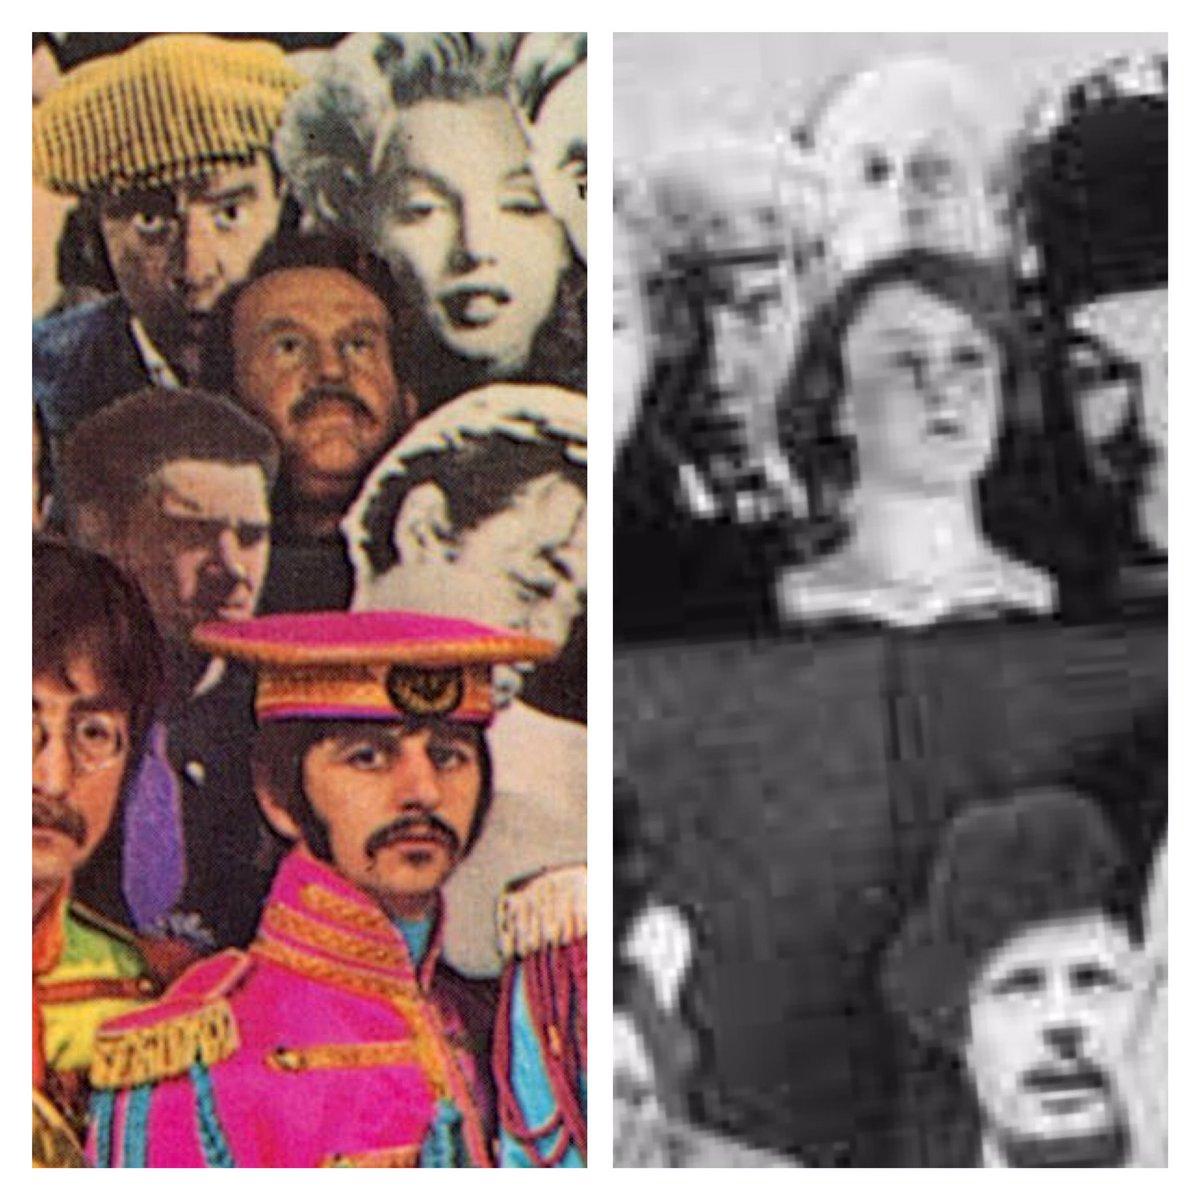 Beatles Sgt. Pepper album cover